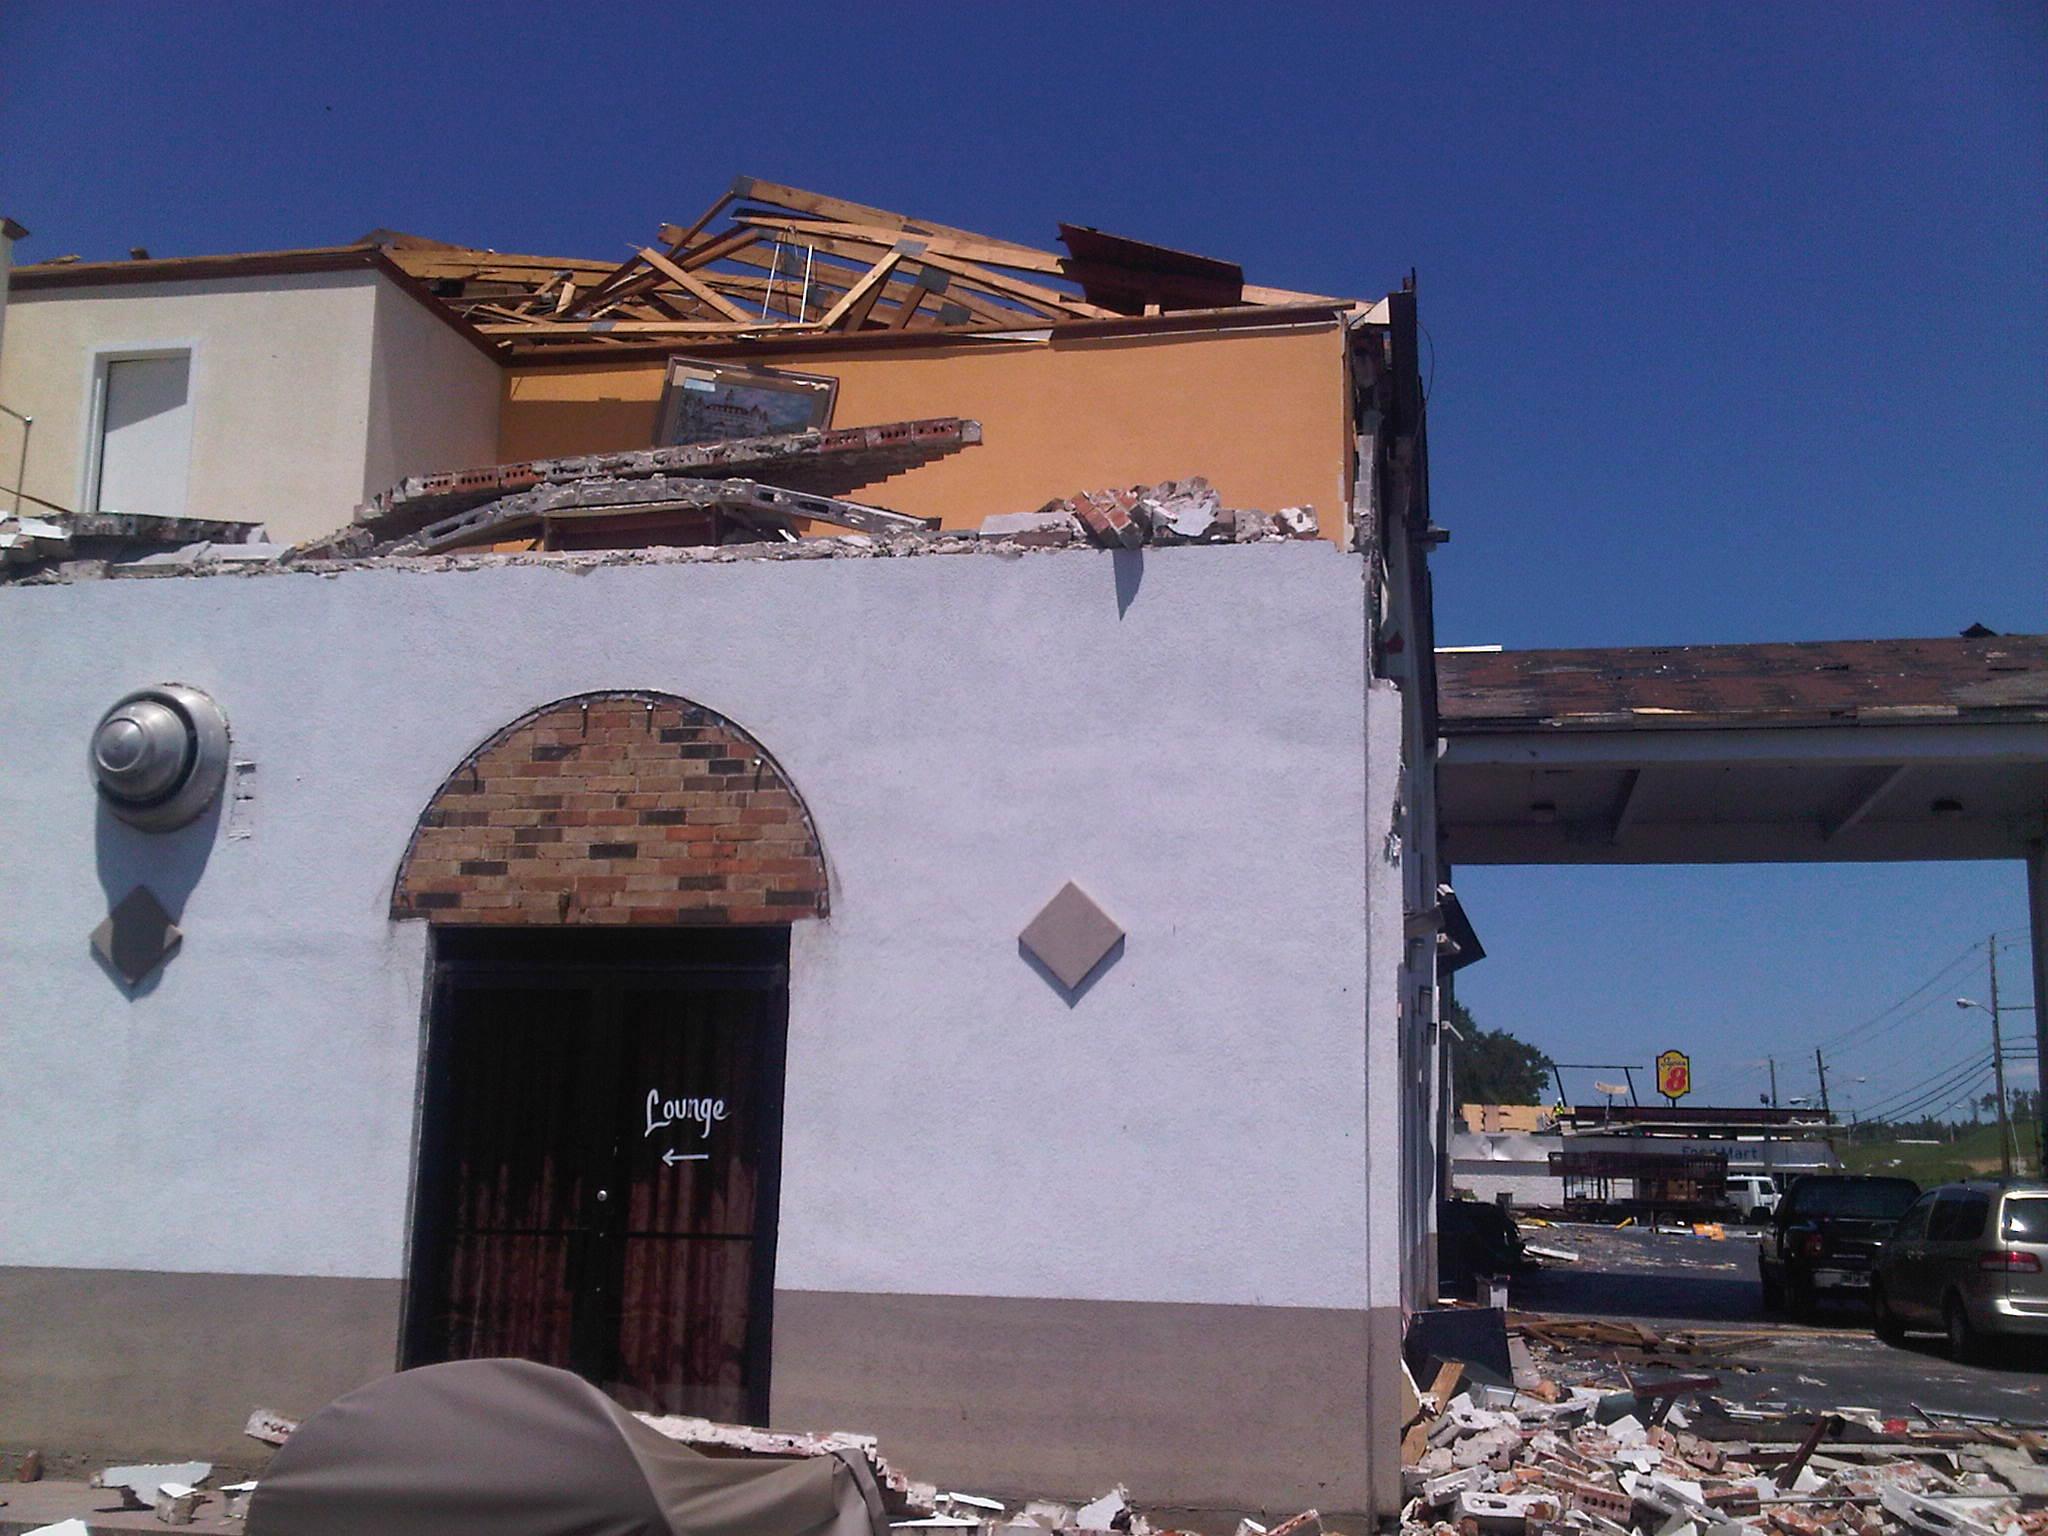 Windstorm Tornado Commercial Claim Business Adjusters International Basloe Levin and Cuccaro